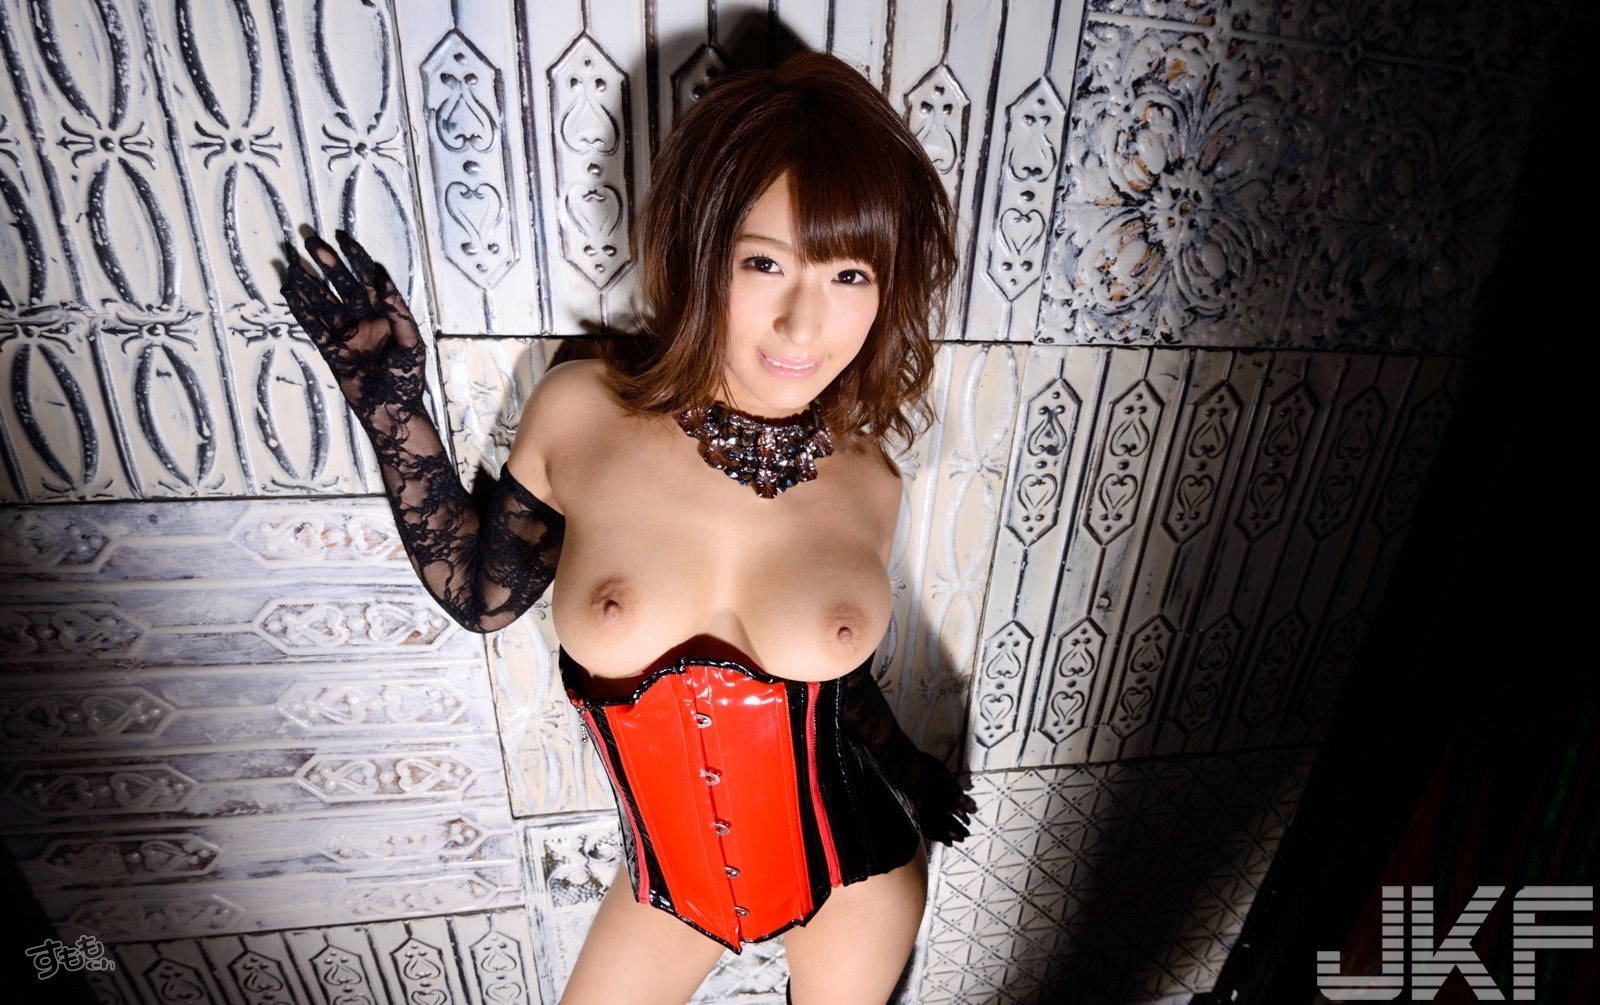 corset_5078-137.jpg